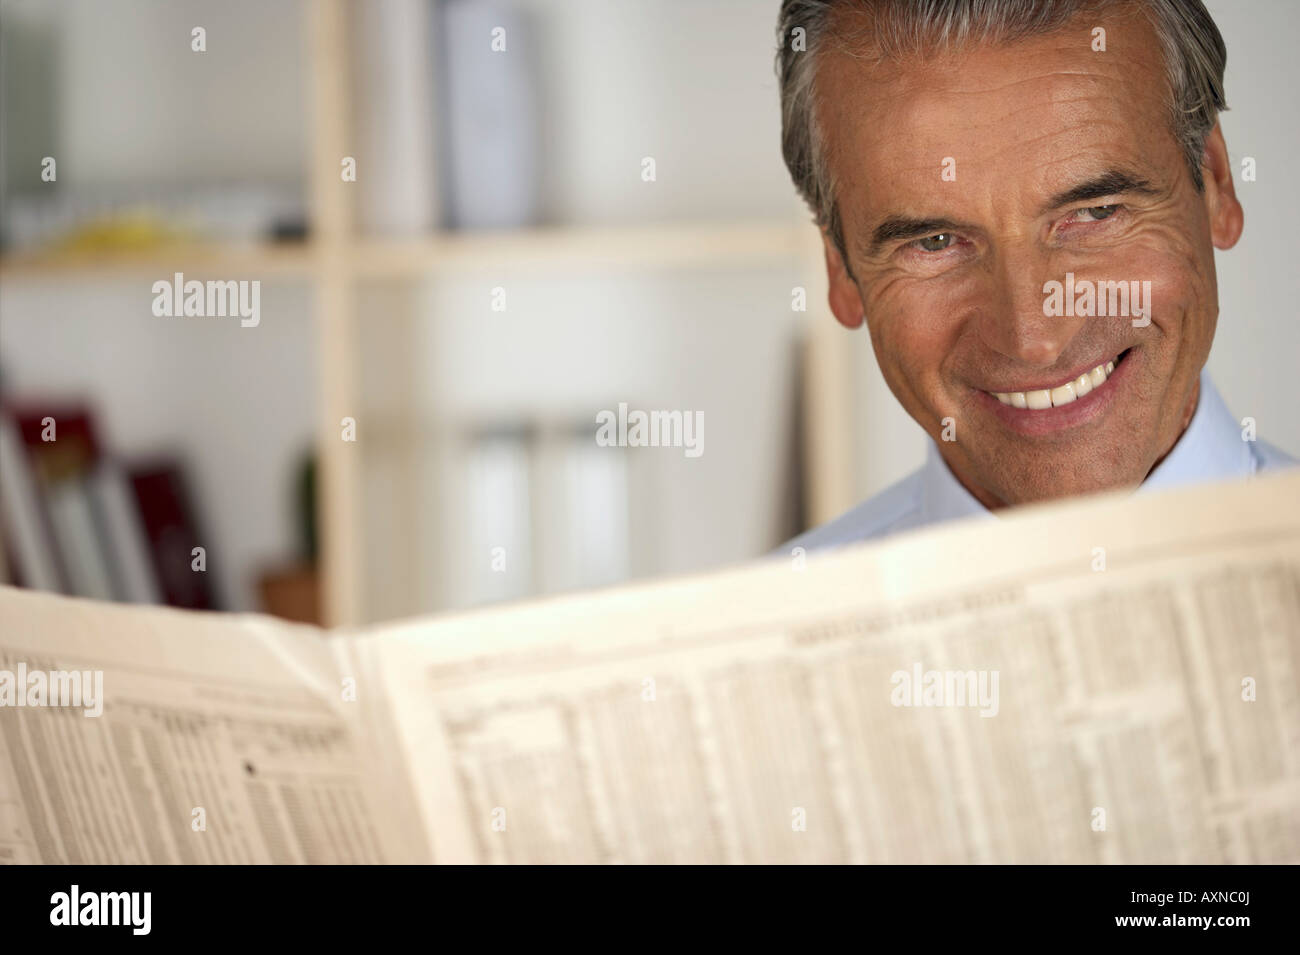 Smiling senior businessman reading a newspaper - Stock Image